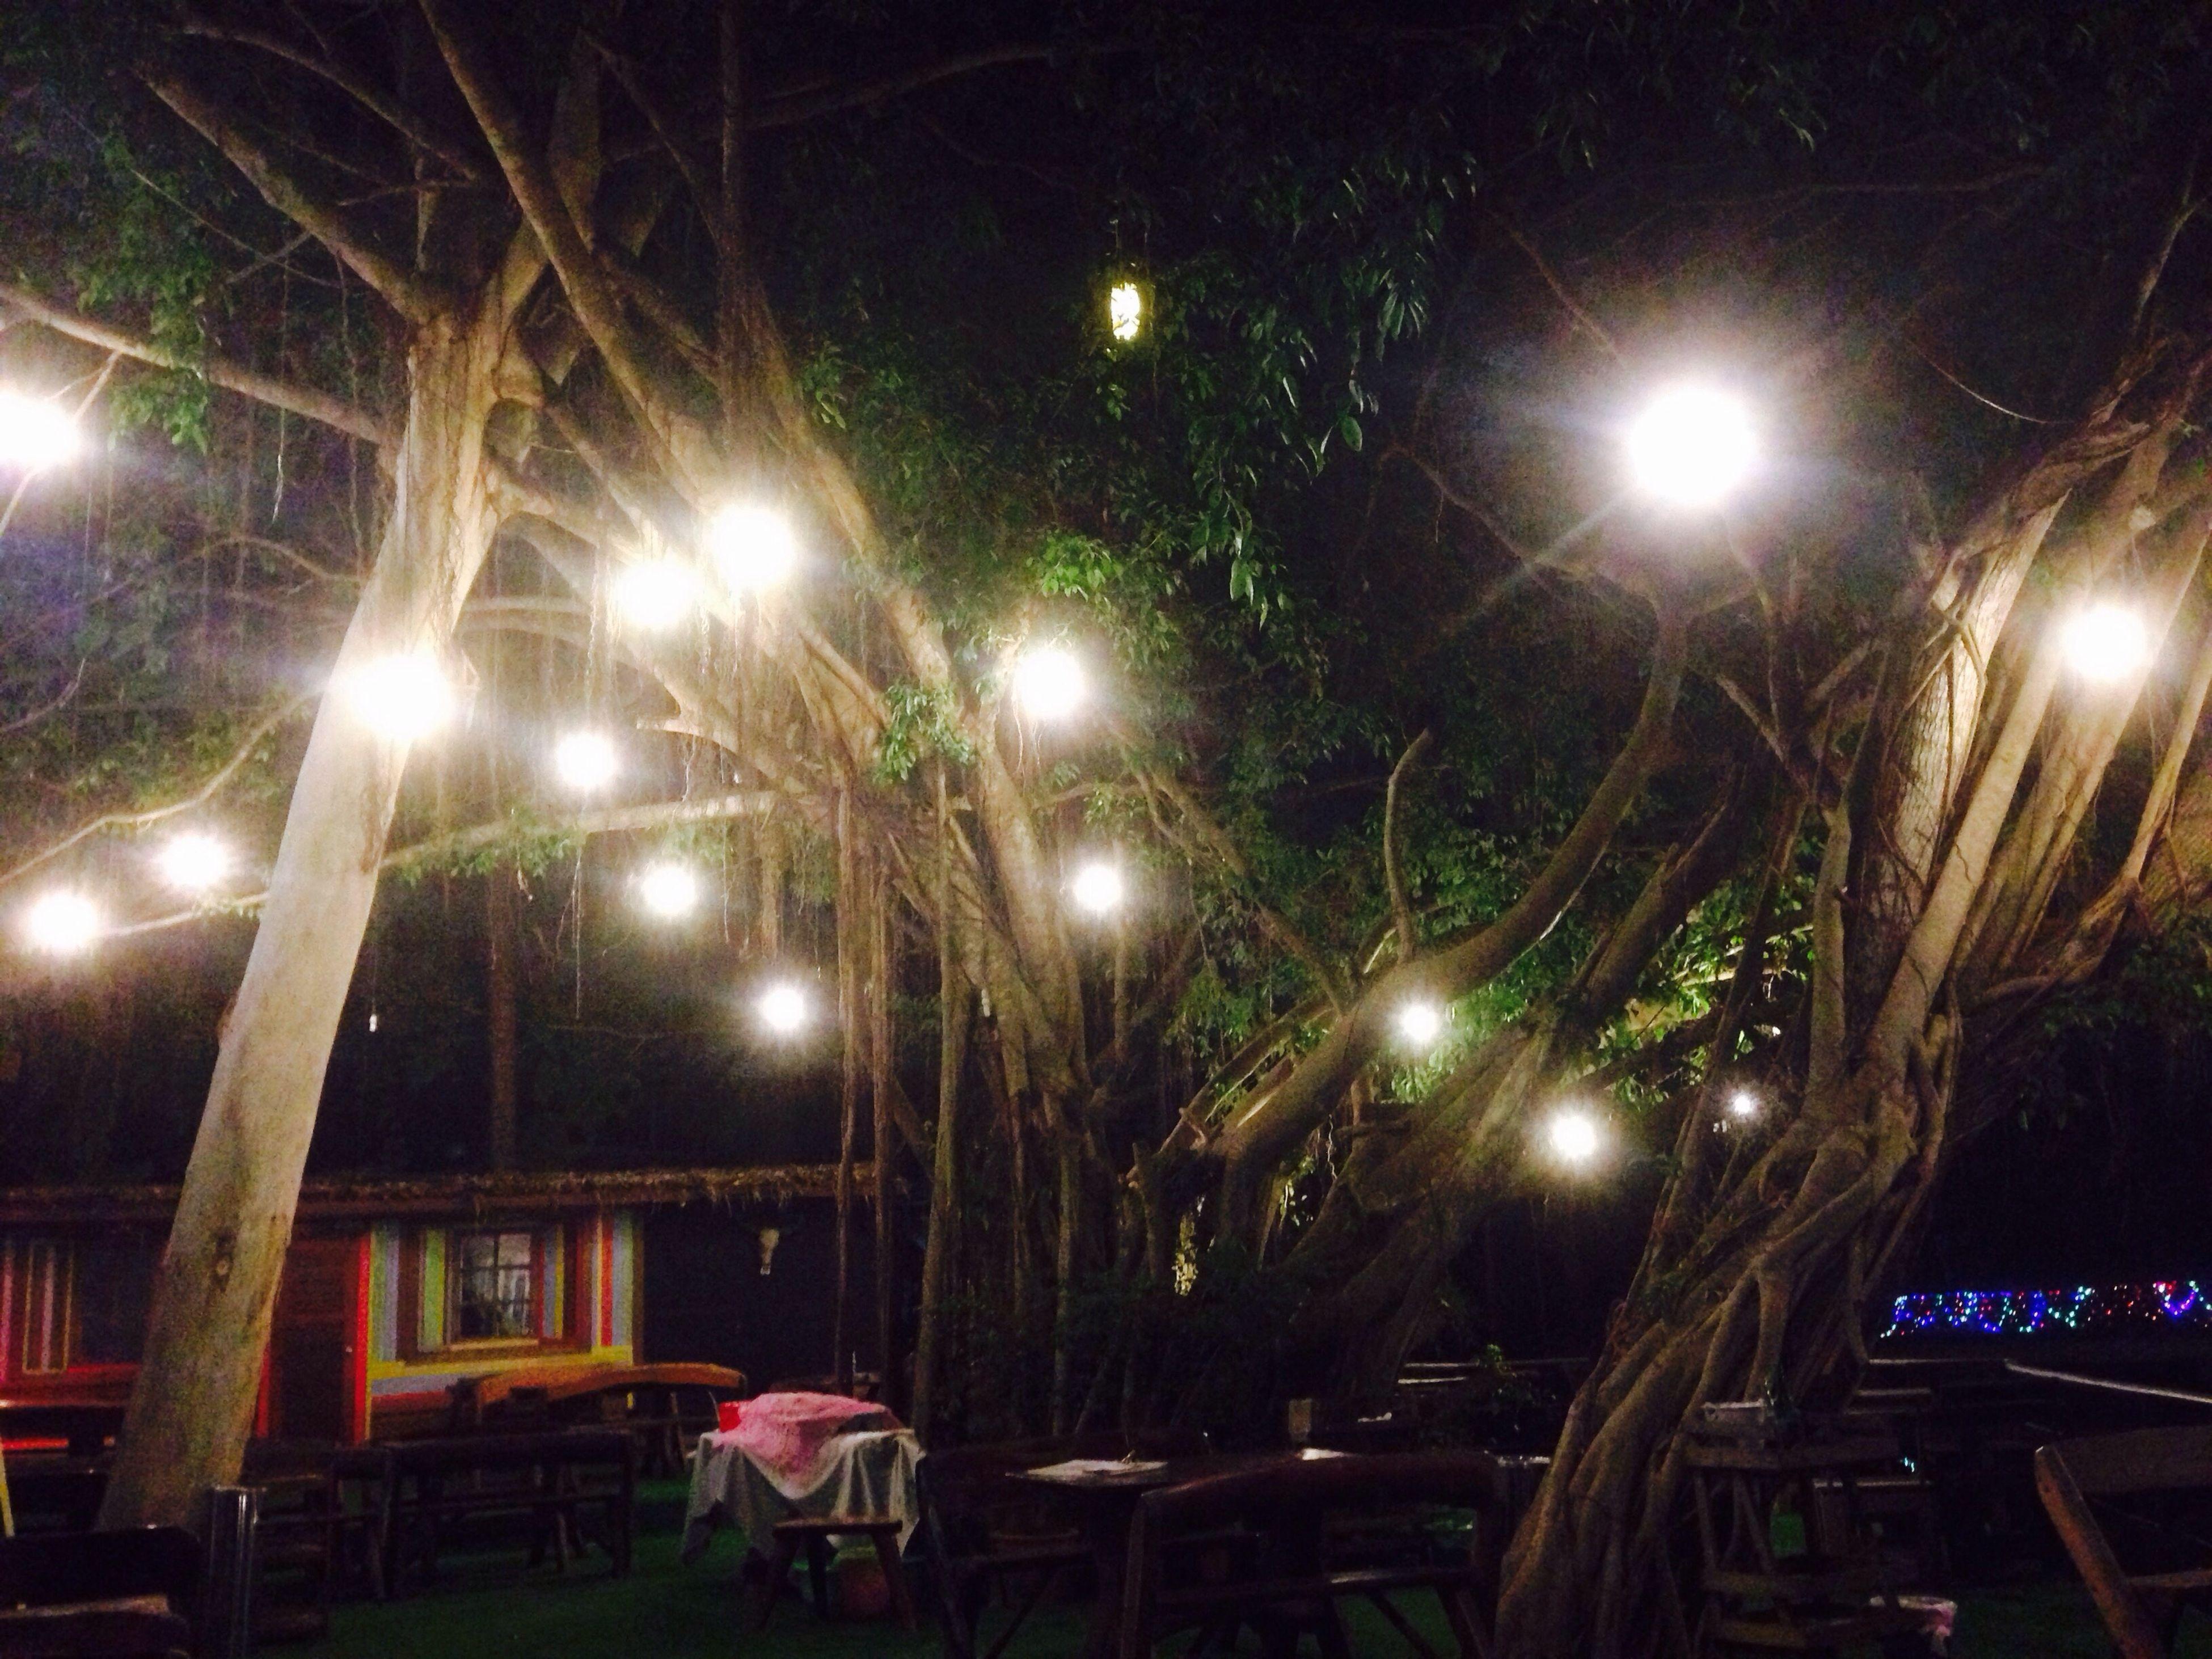 night, illuminated, lighting equipment, no people, architecture, outdoors, sky